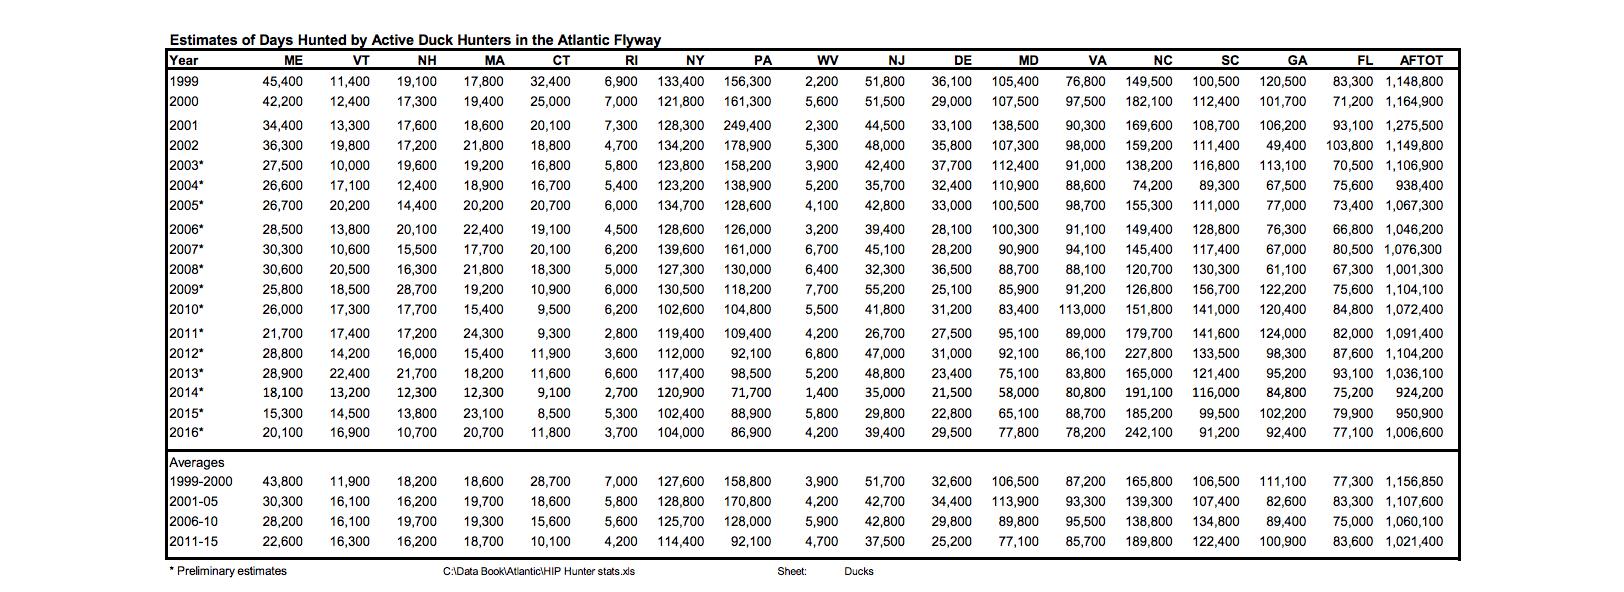 usfws_databook_example